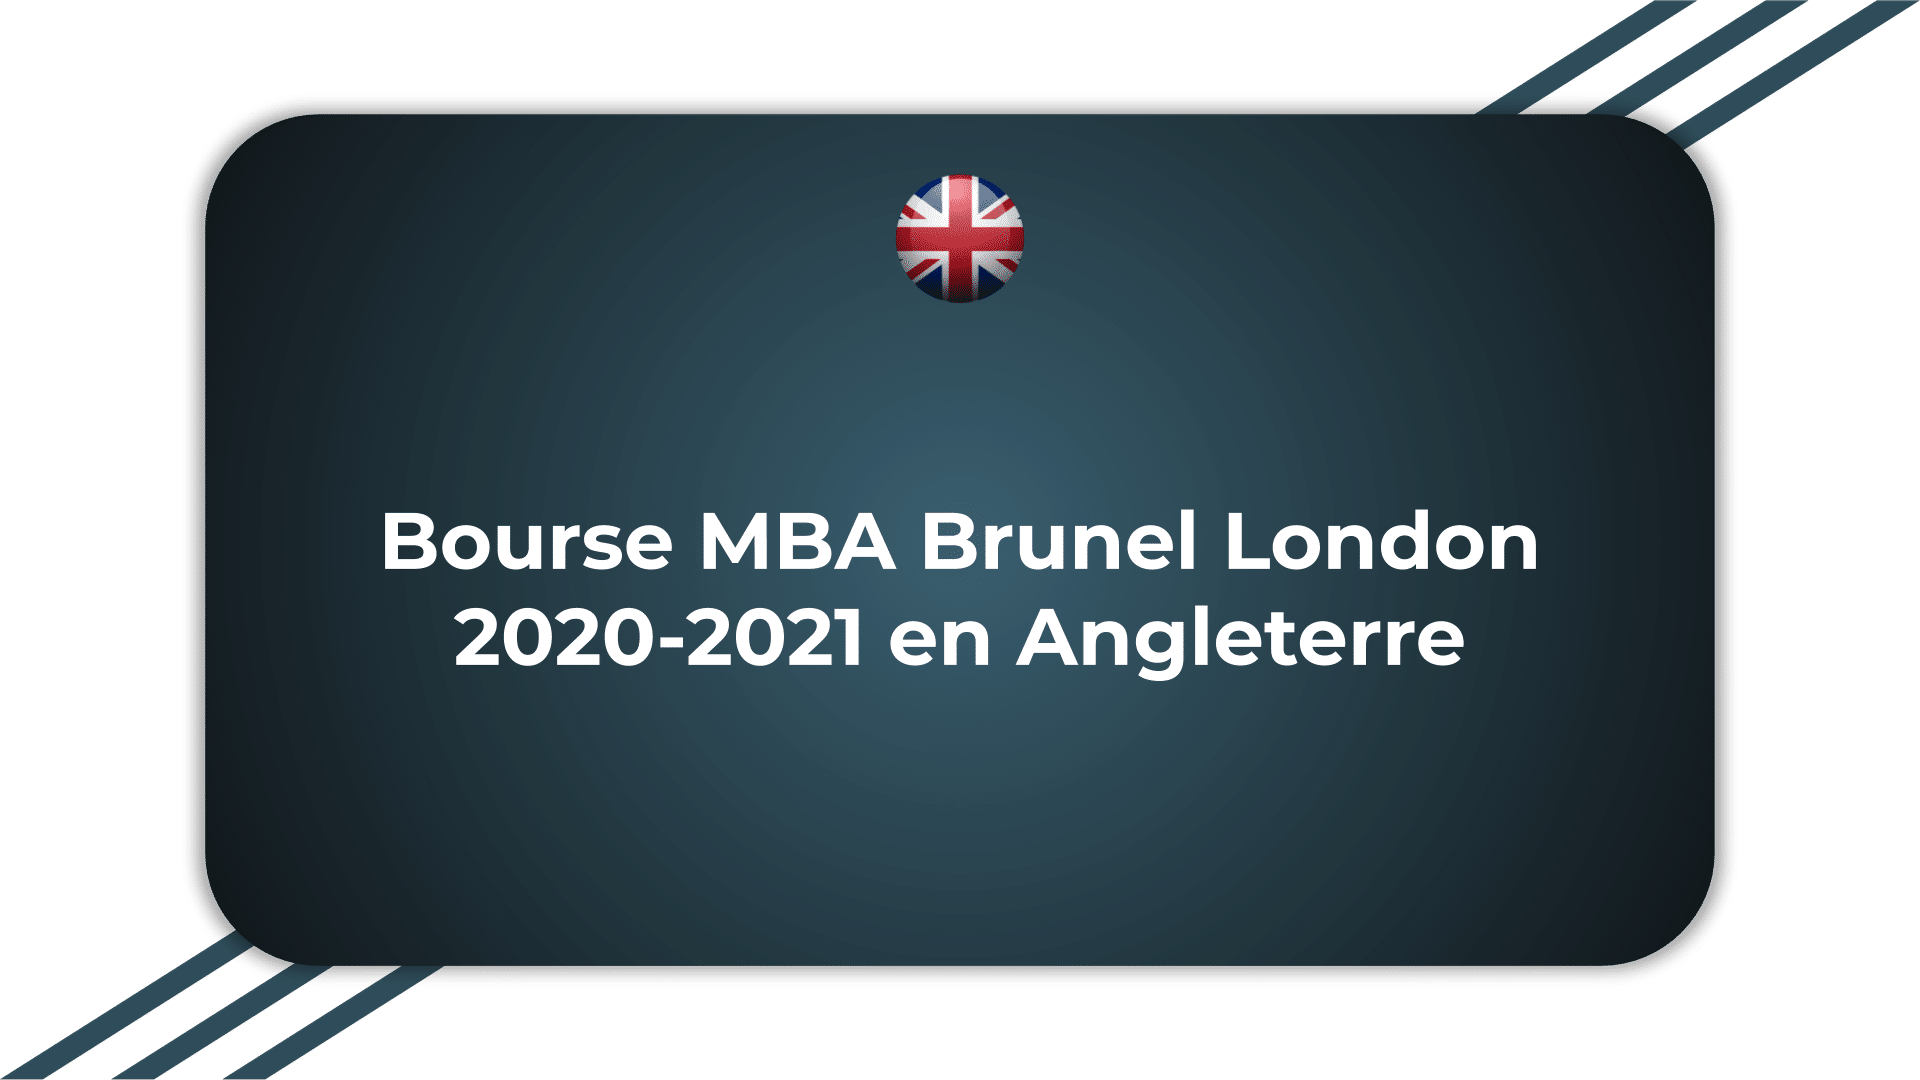 Bourse MBA Brunel London